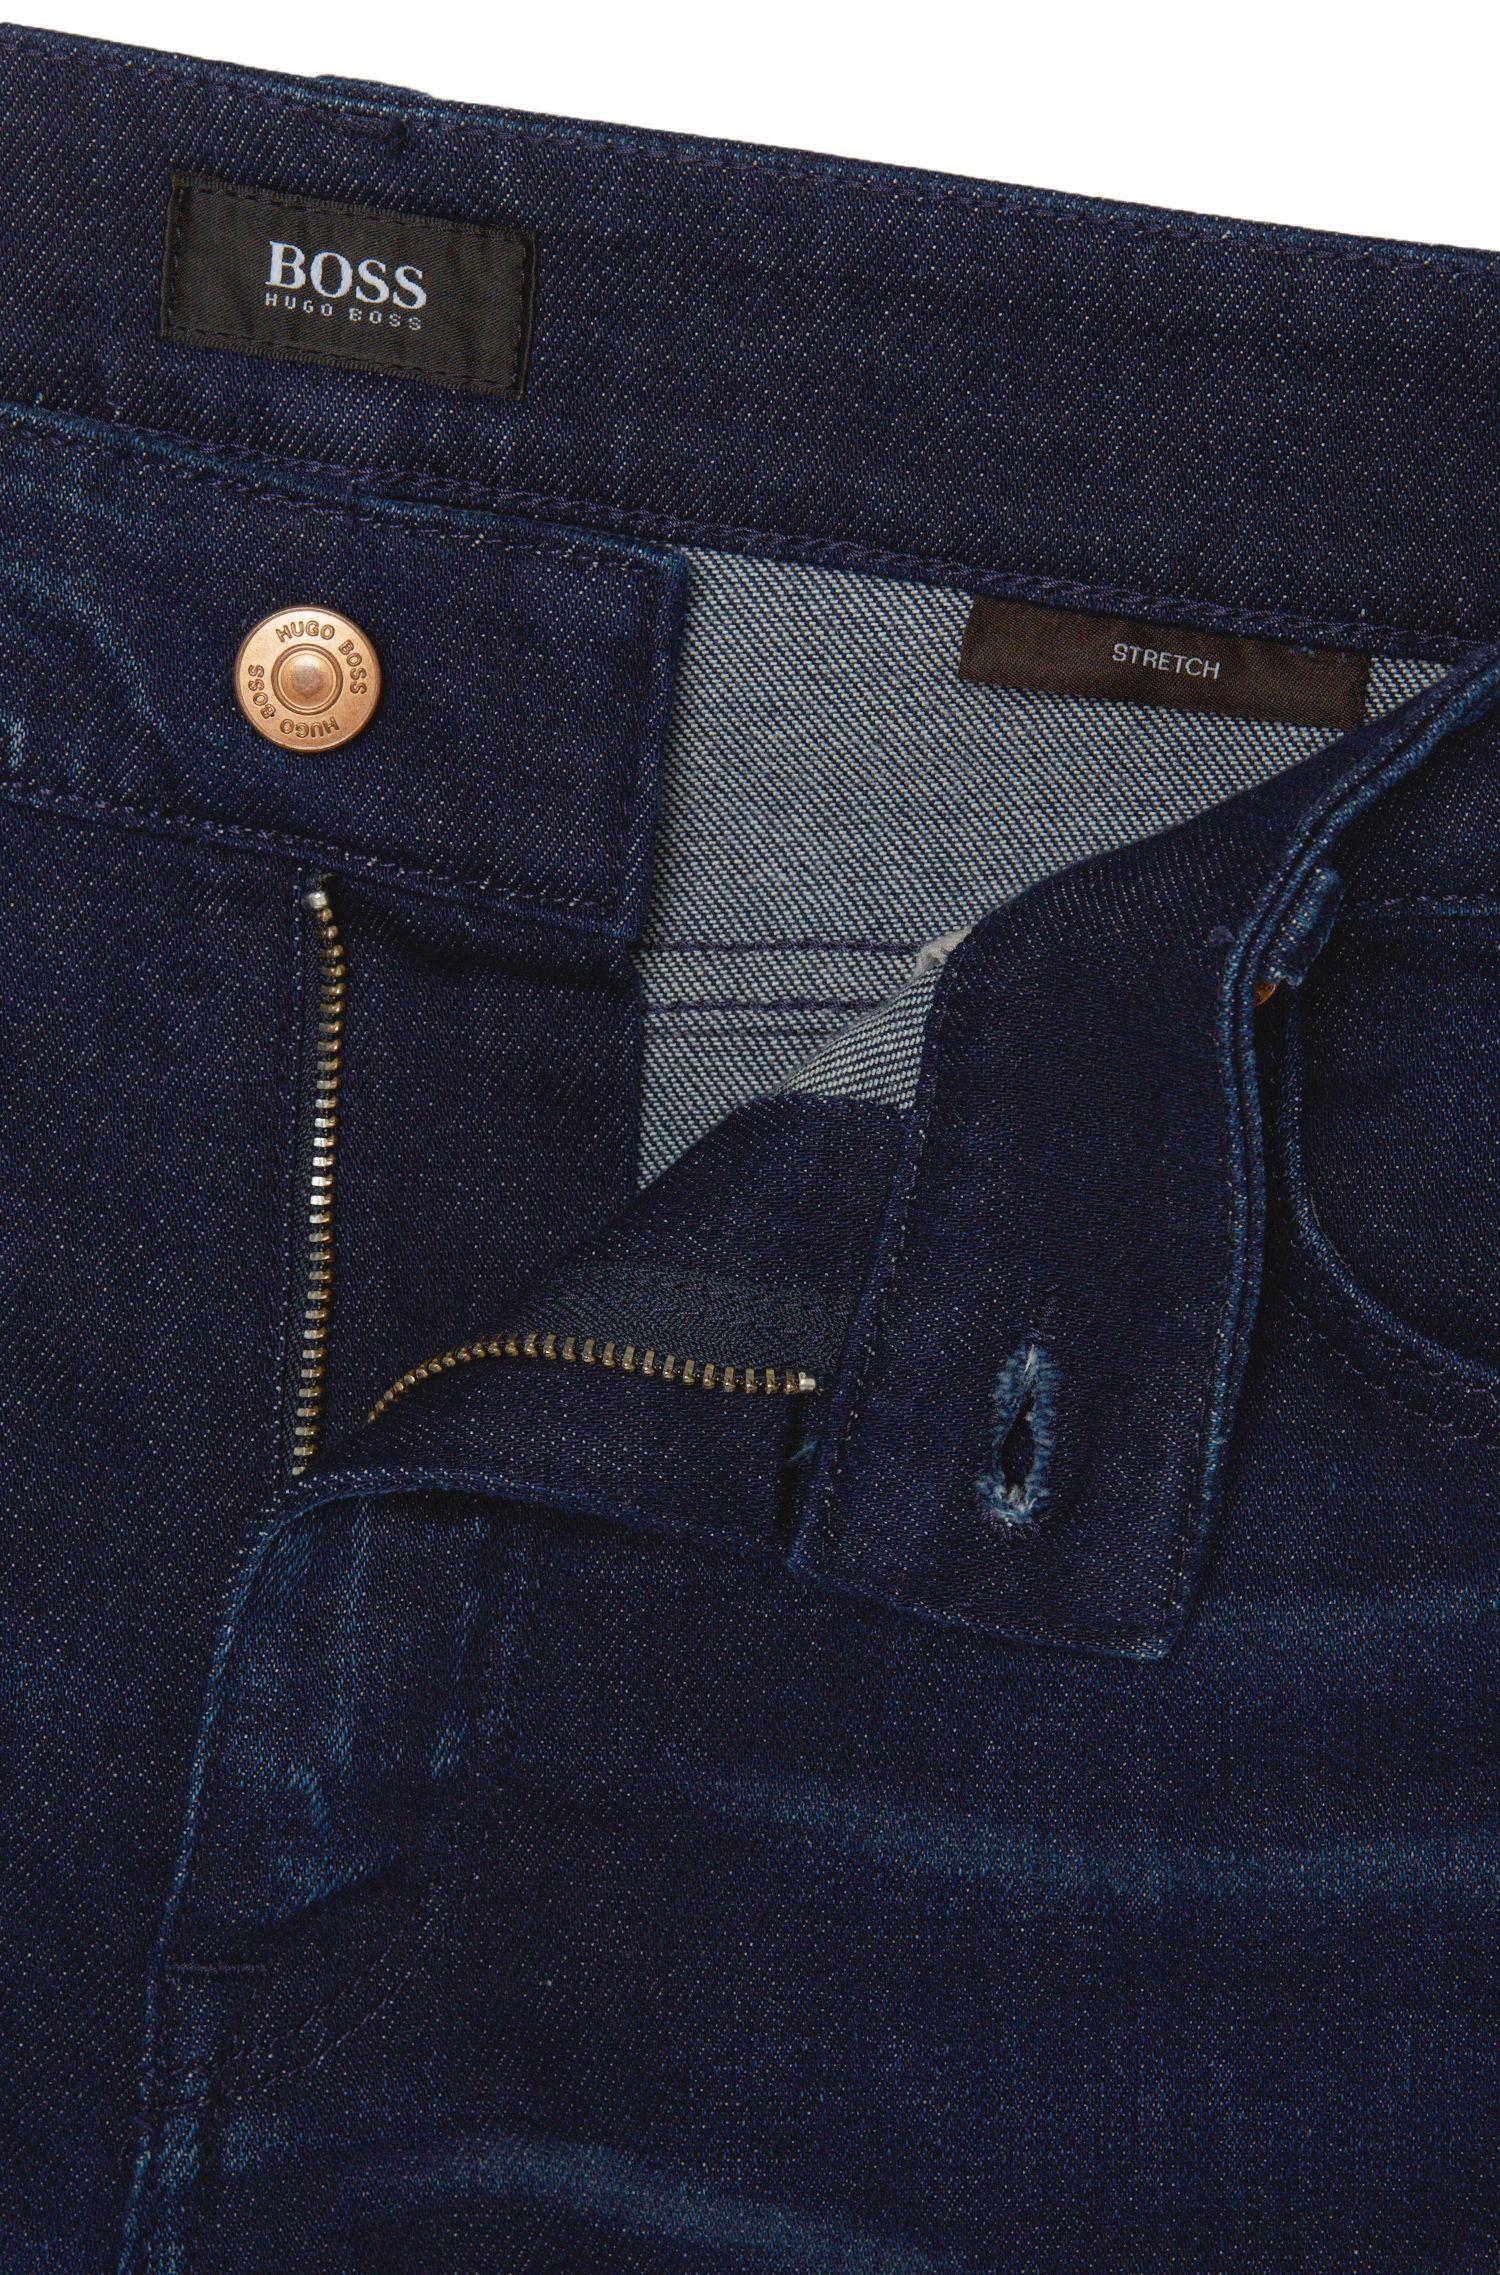 11.5 oz Stretch Cotton Blend Jeans, Regular Fit | Maine